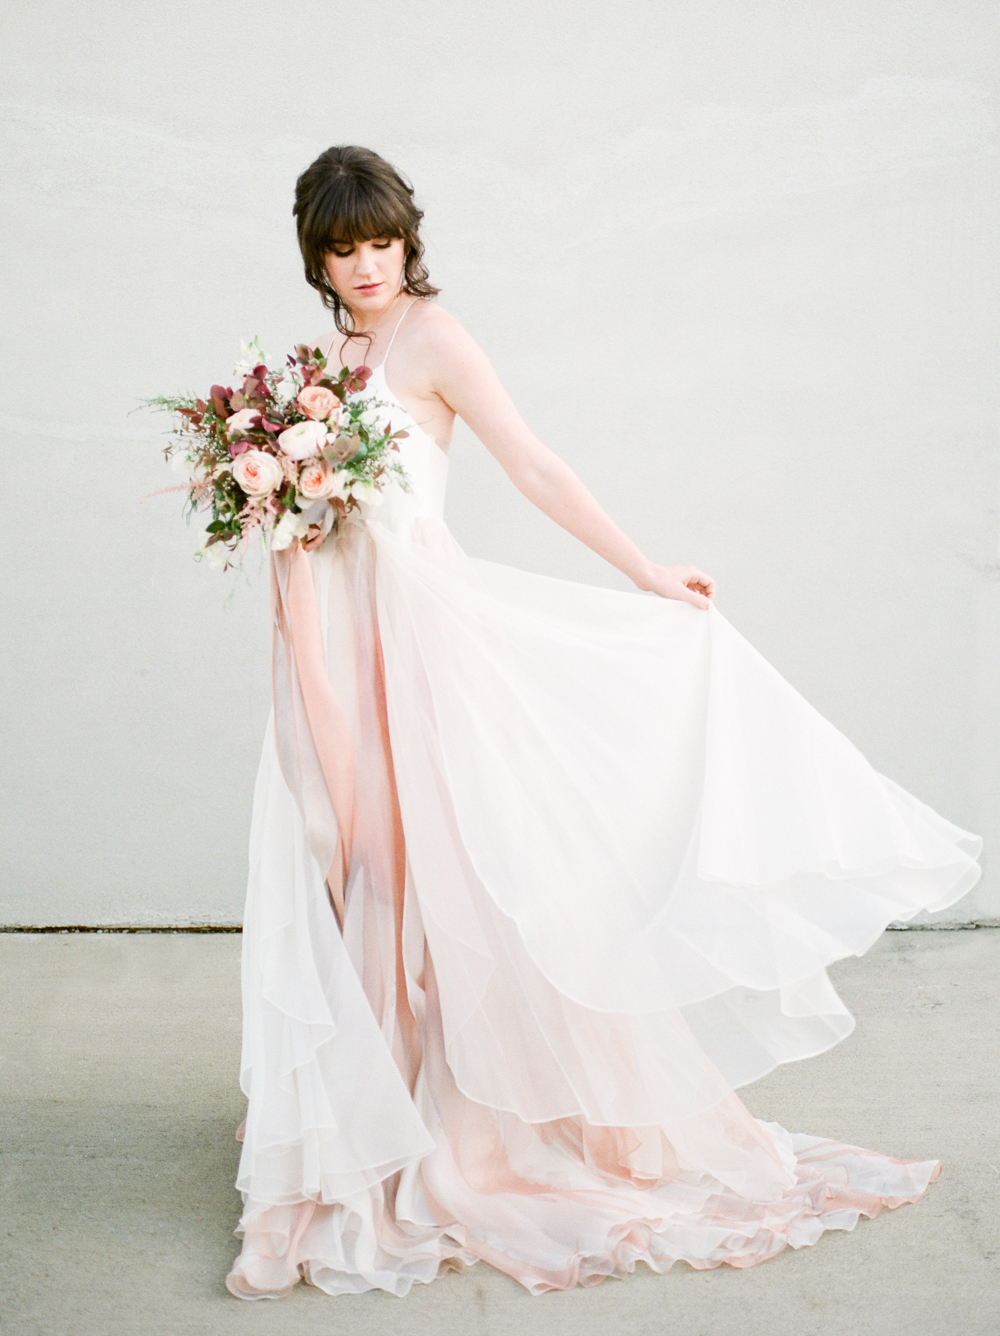 A lovely houston bride_wedding_Christine Gosch_www.christinegosch.com_Houston, TX-2.jpg